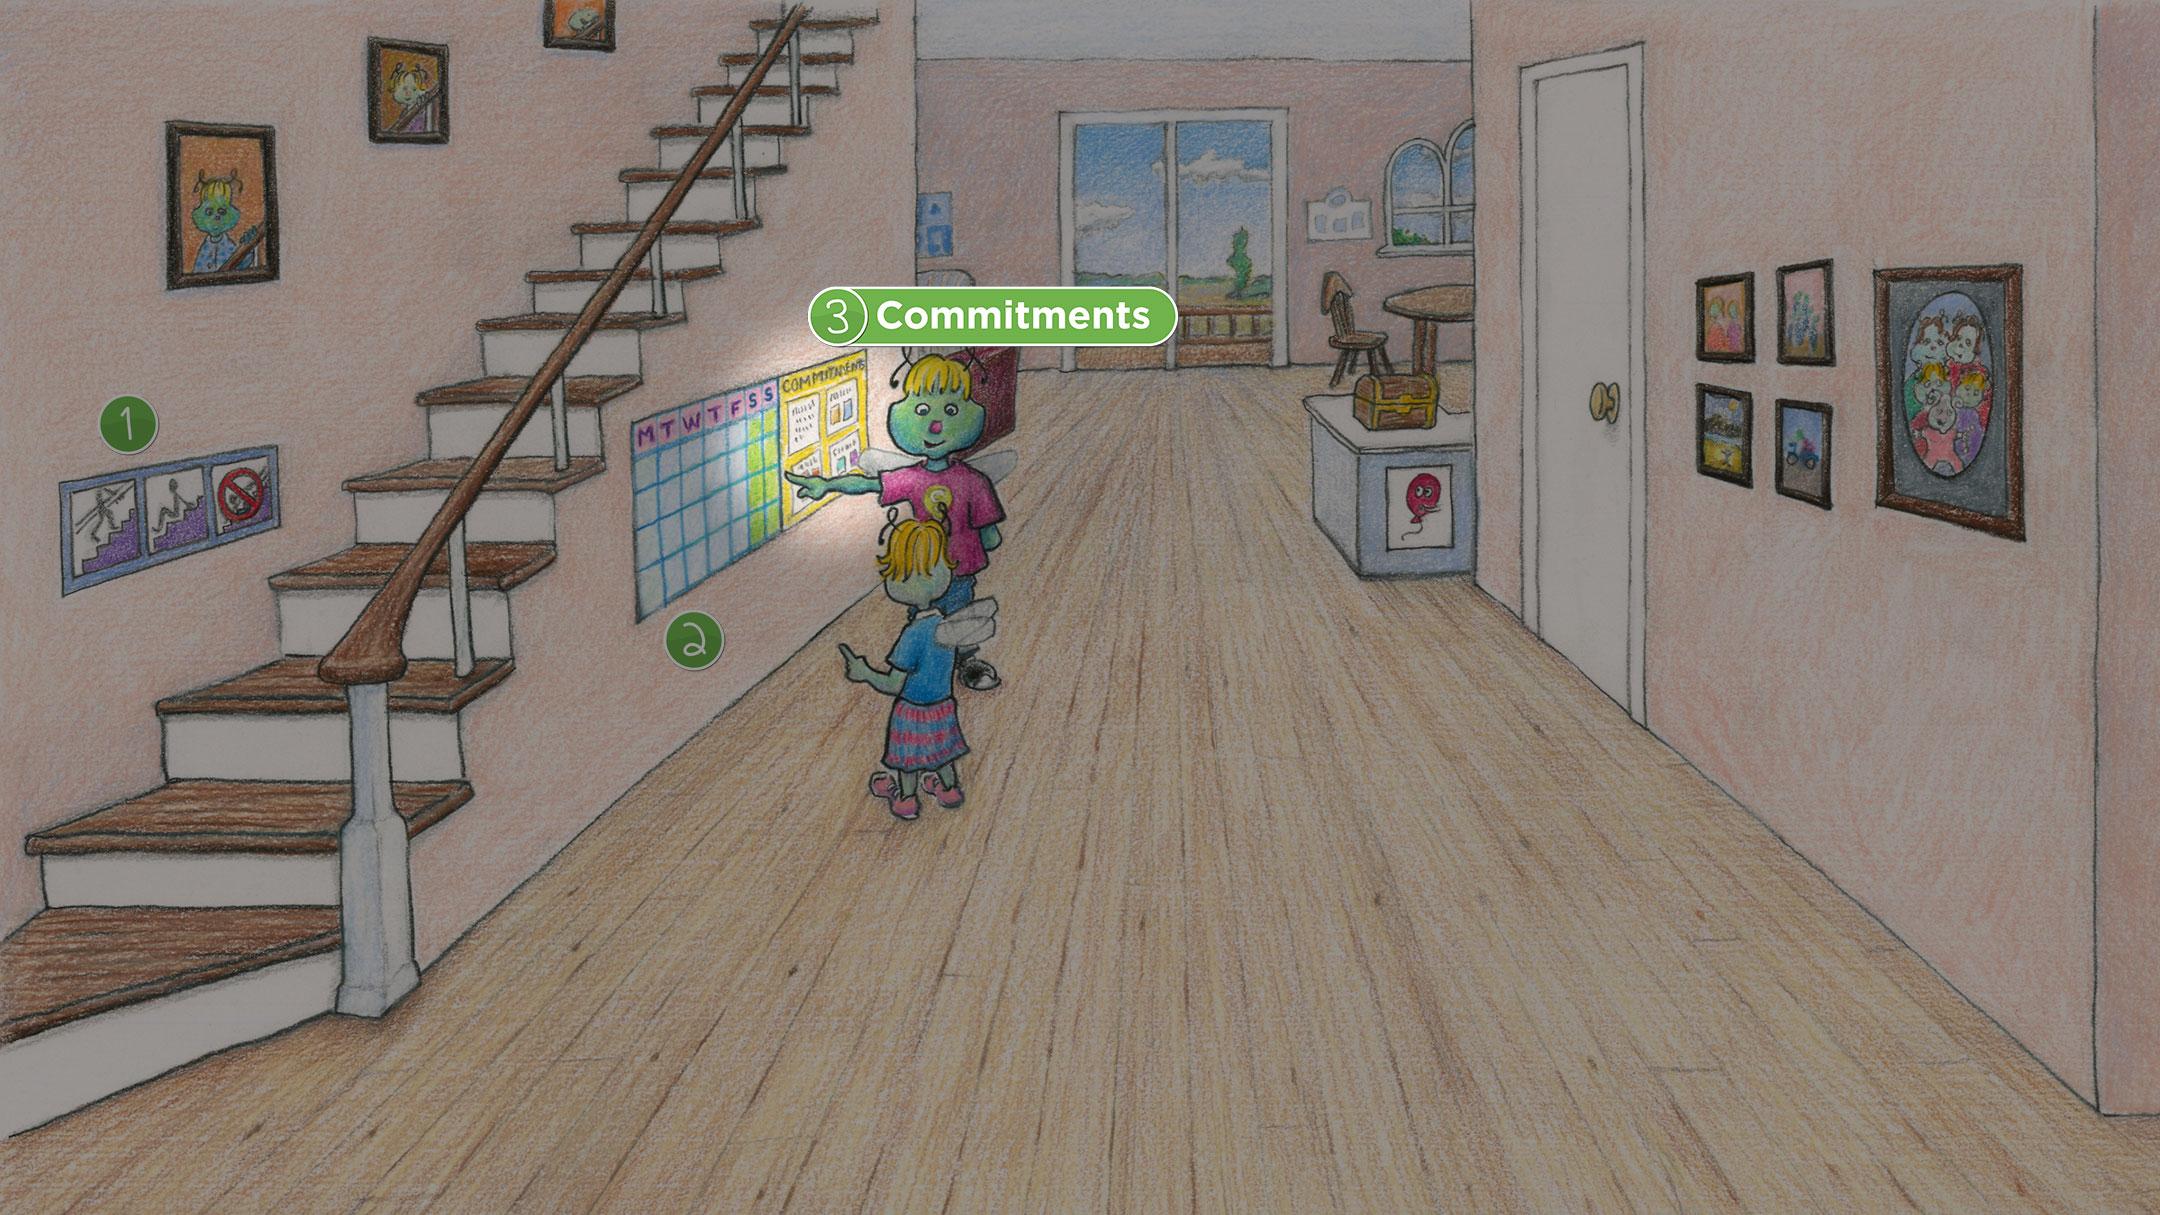 Hallway: Commitments